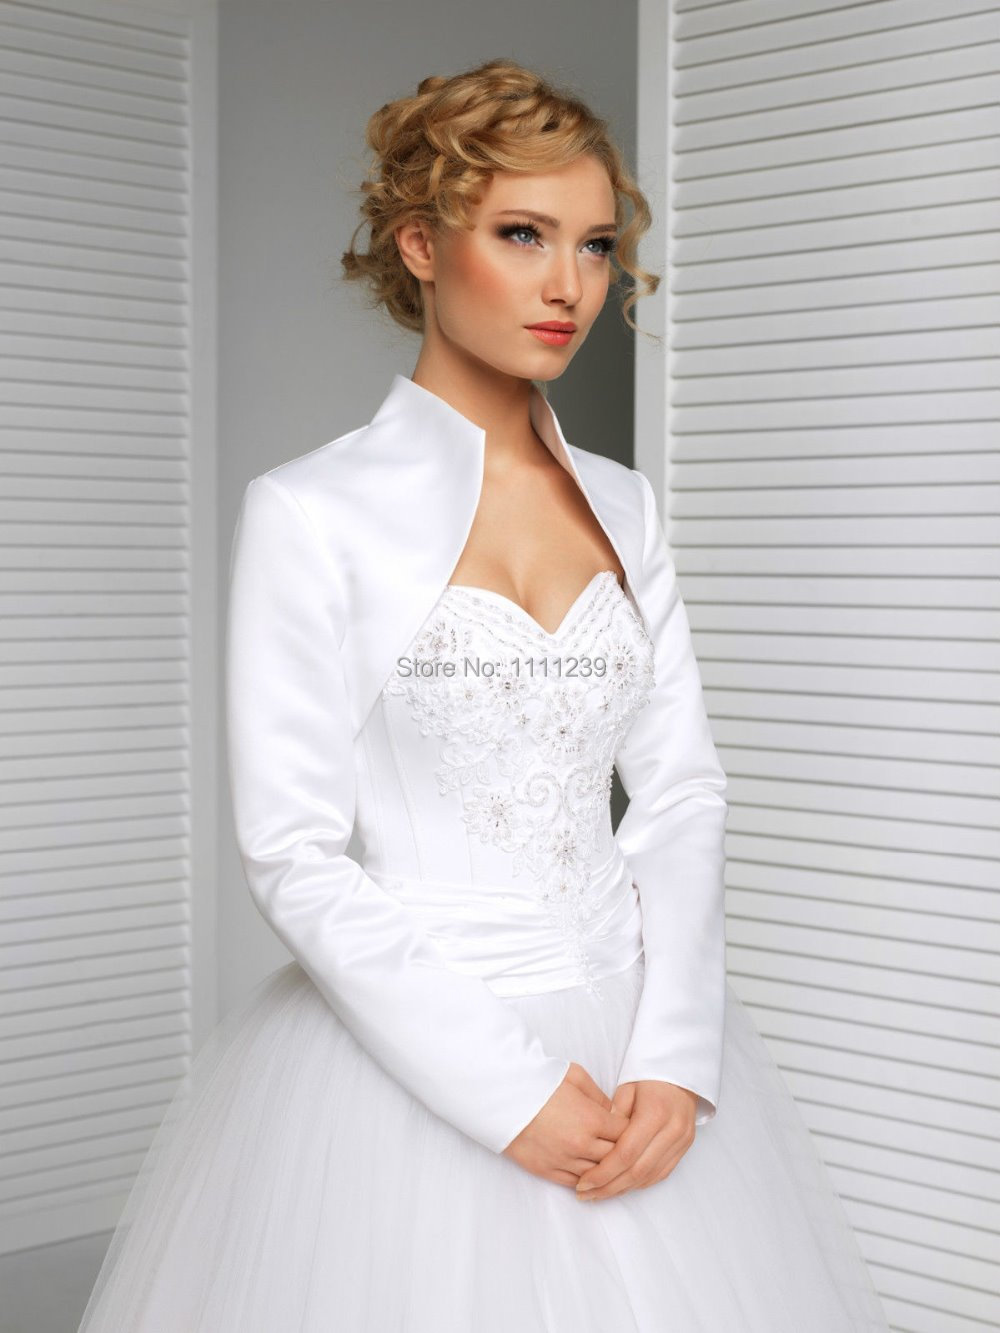 Satin wedding dress jackets dress blog edin satin wedding dress jackets ombrellifo Images